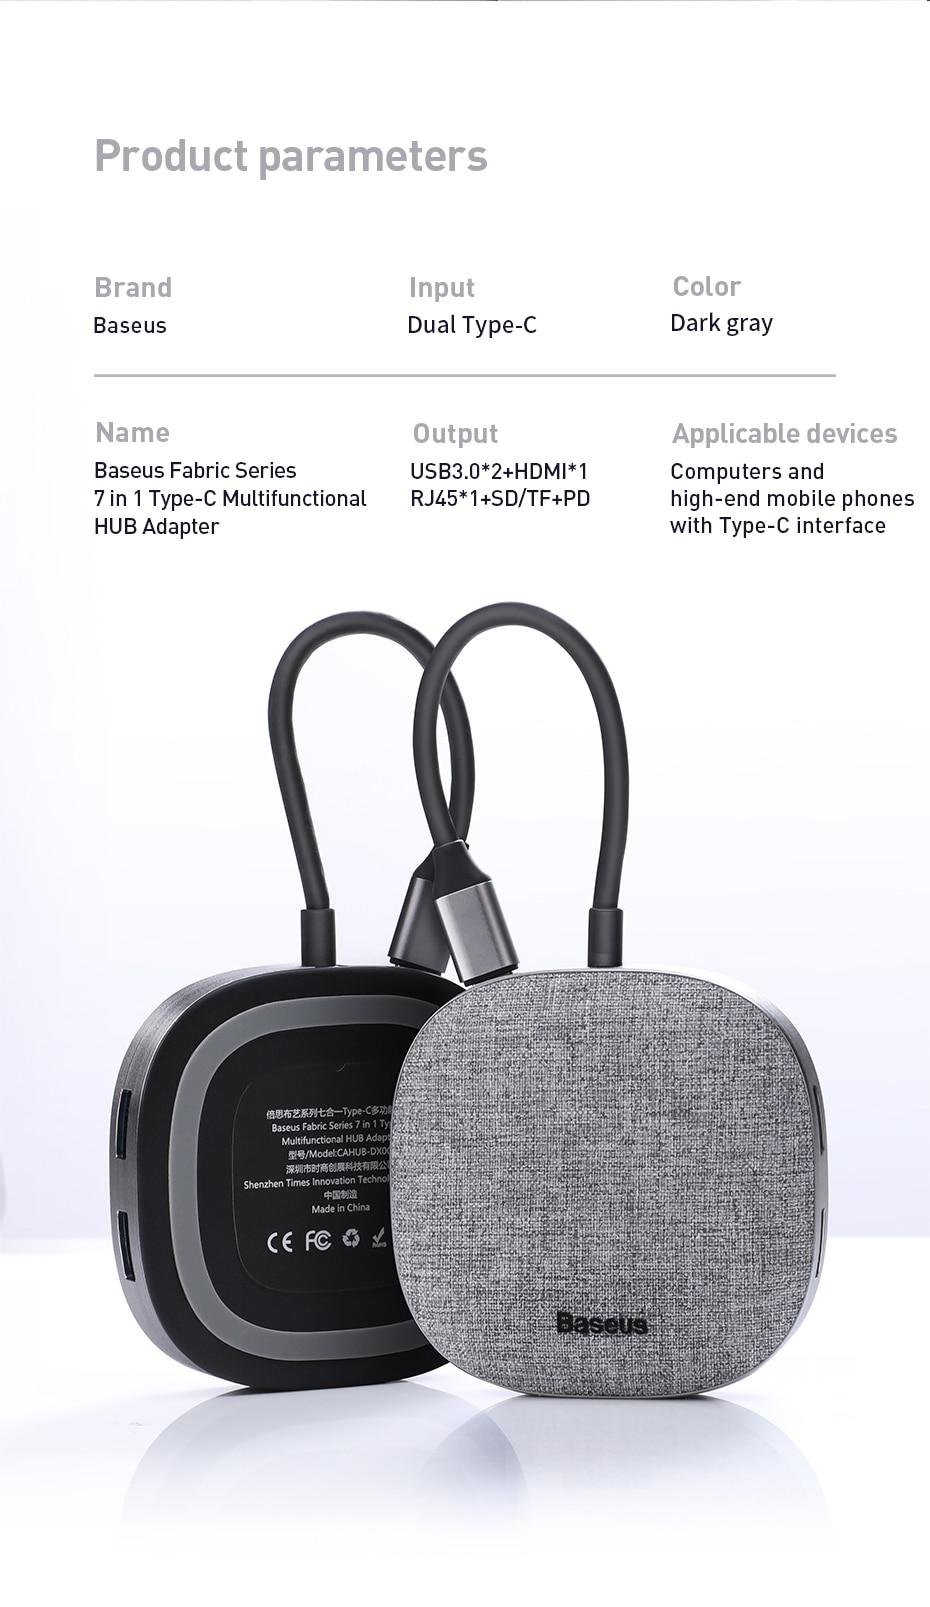 Baseus Frabric Series 7 in 1 Type-C Multifunctional HUB Adapter13